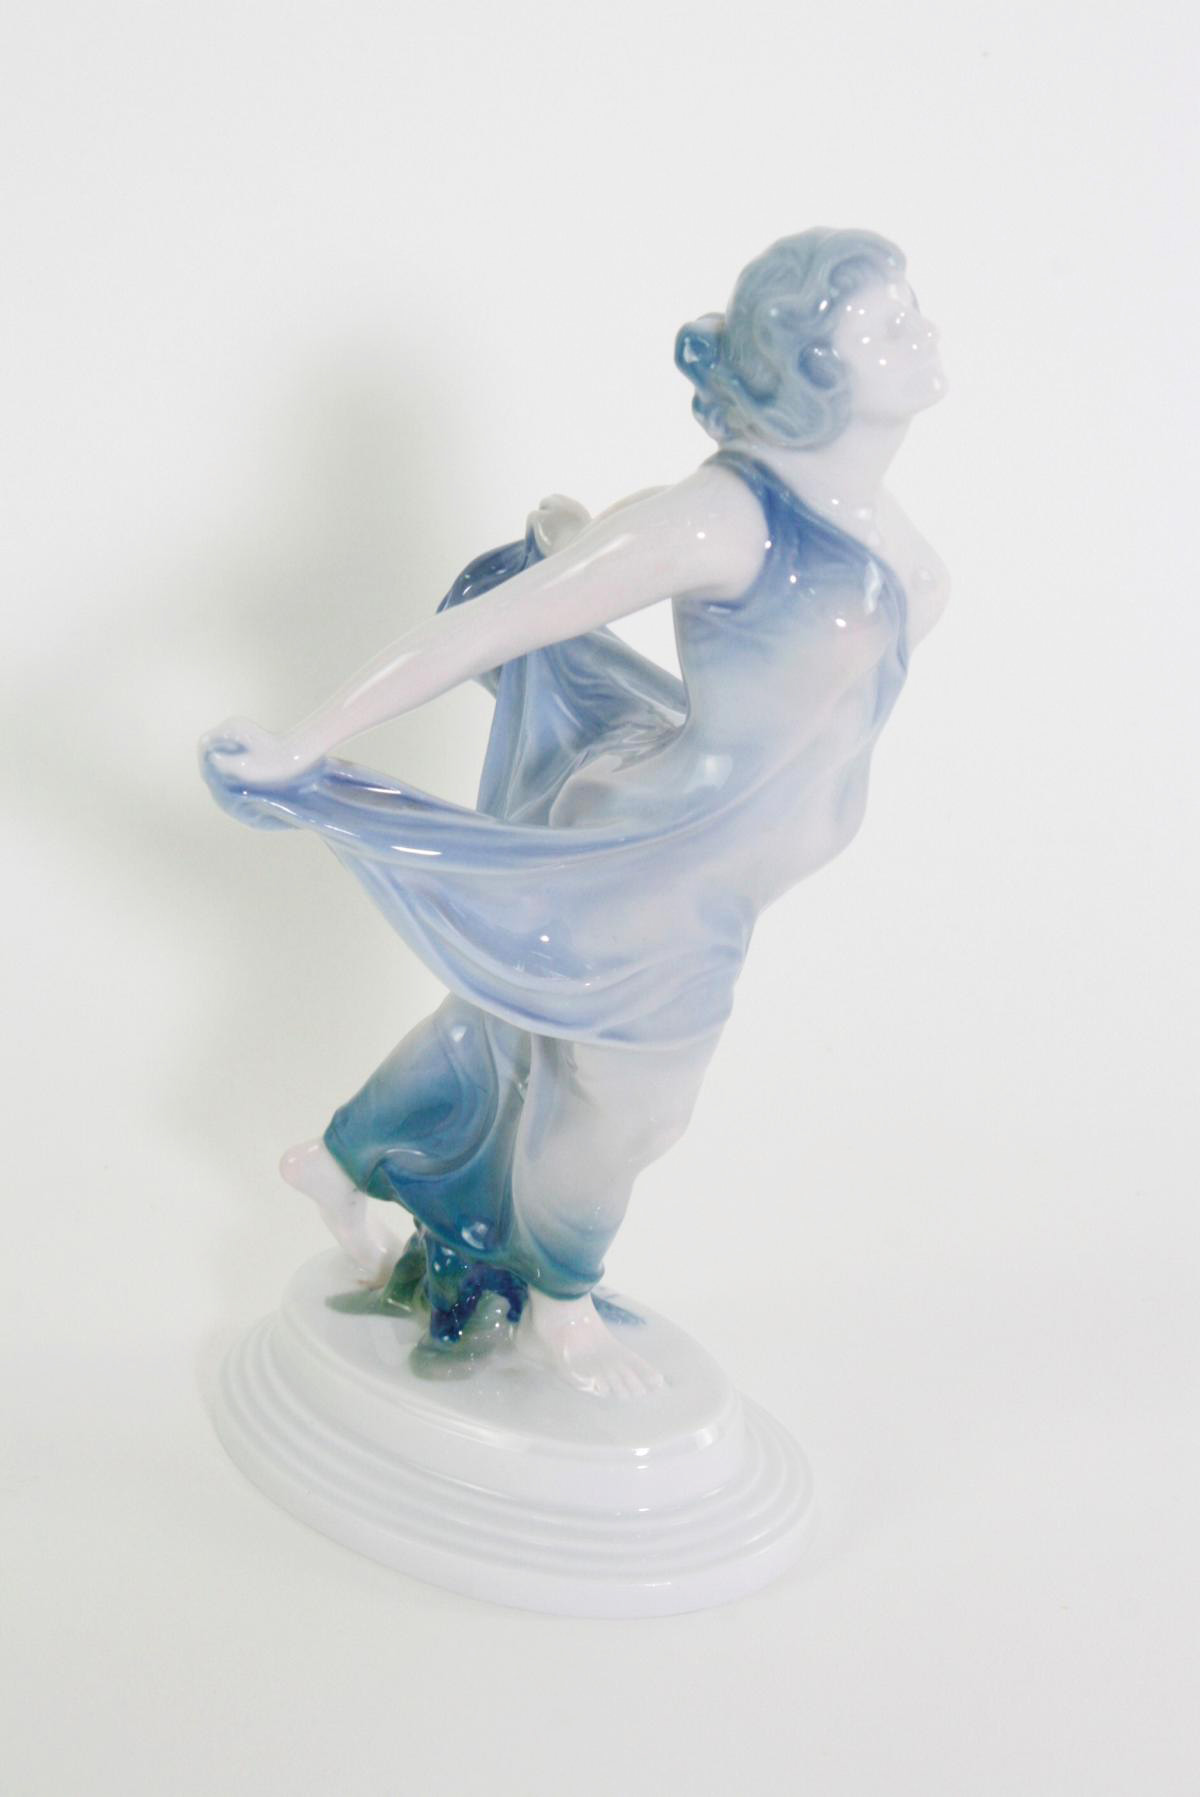 Porzellanskulptur, 'Tänzerin', Rosenthal, Kunst-Abteilung, 1920er Jahre-3